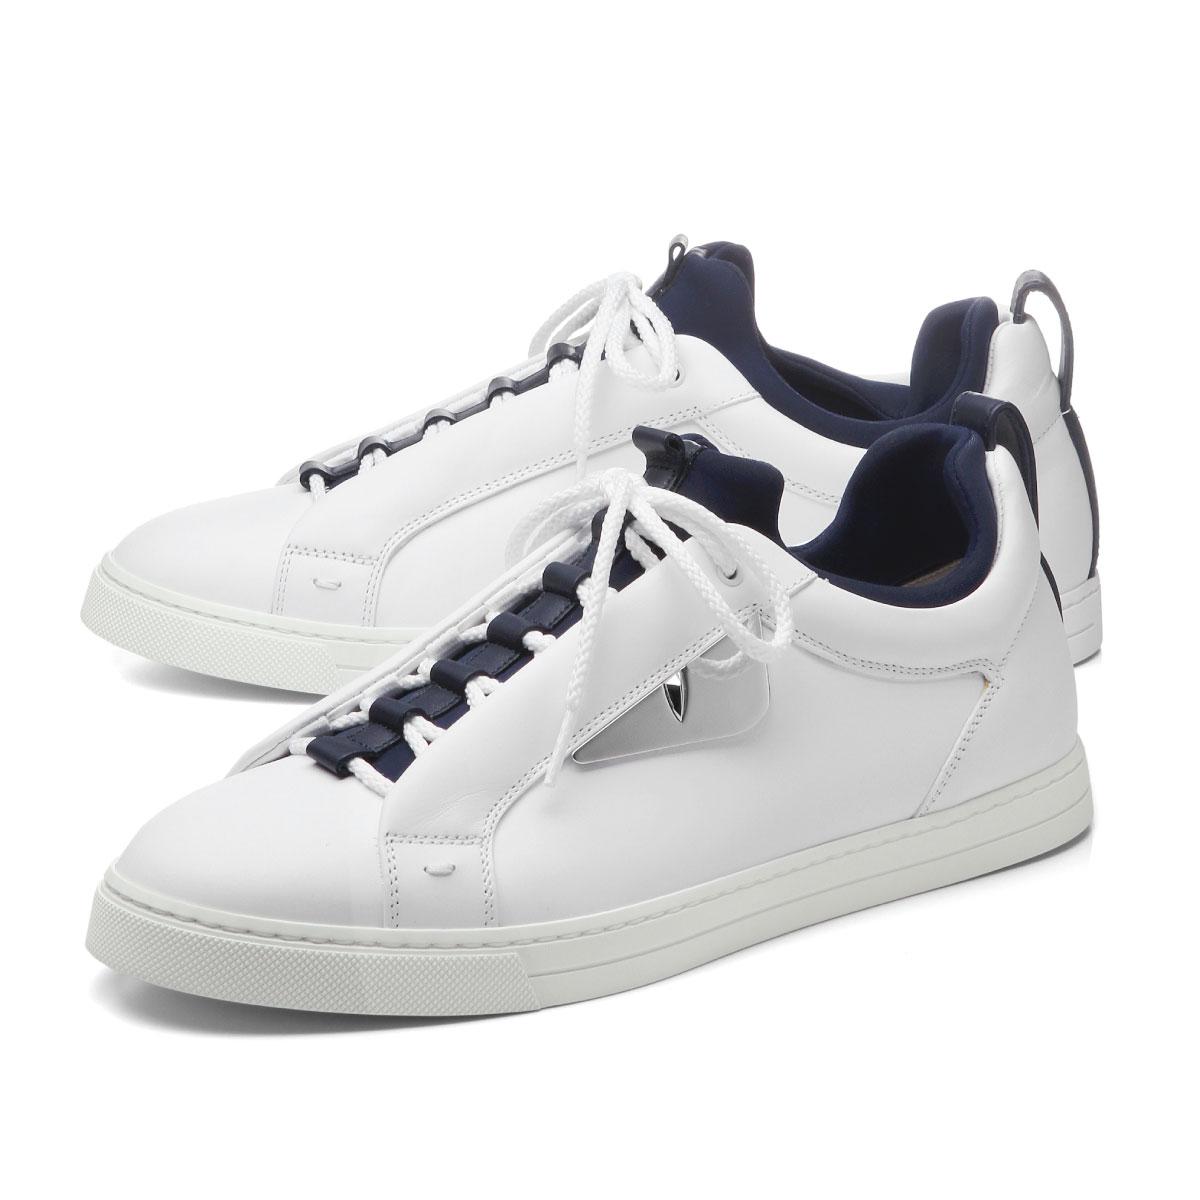 complete in specifications famous designer brand good texture Fendi FENDI shoes men 7E1021 A0U3 F1ORN sneakers WHITE+BLUEBERRY+BLU white